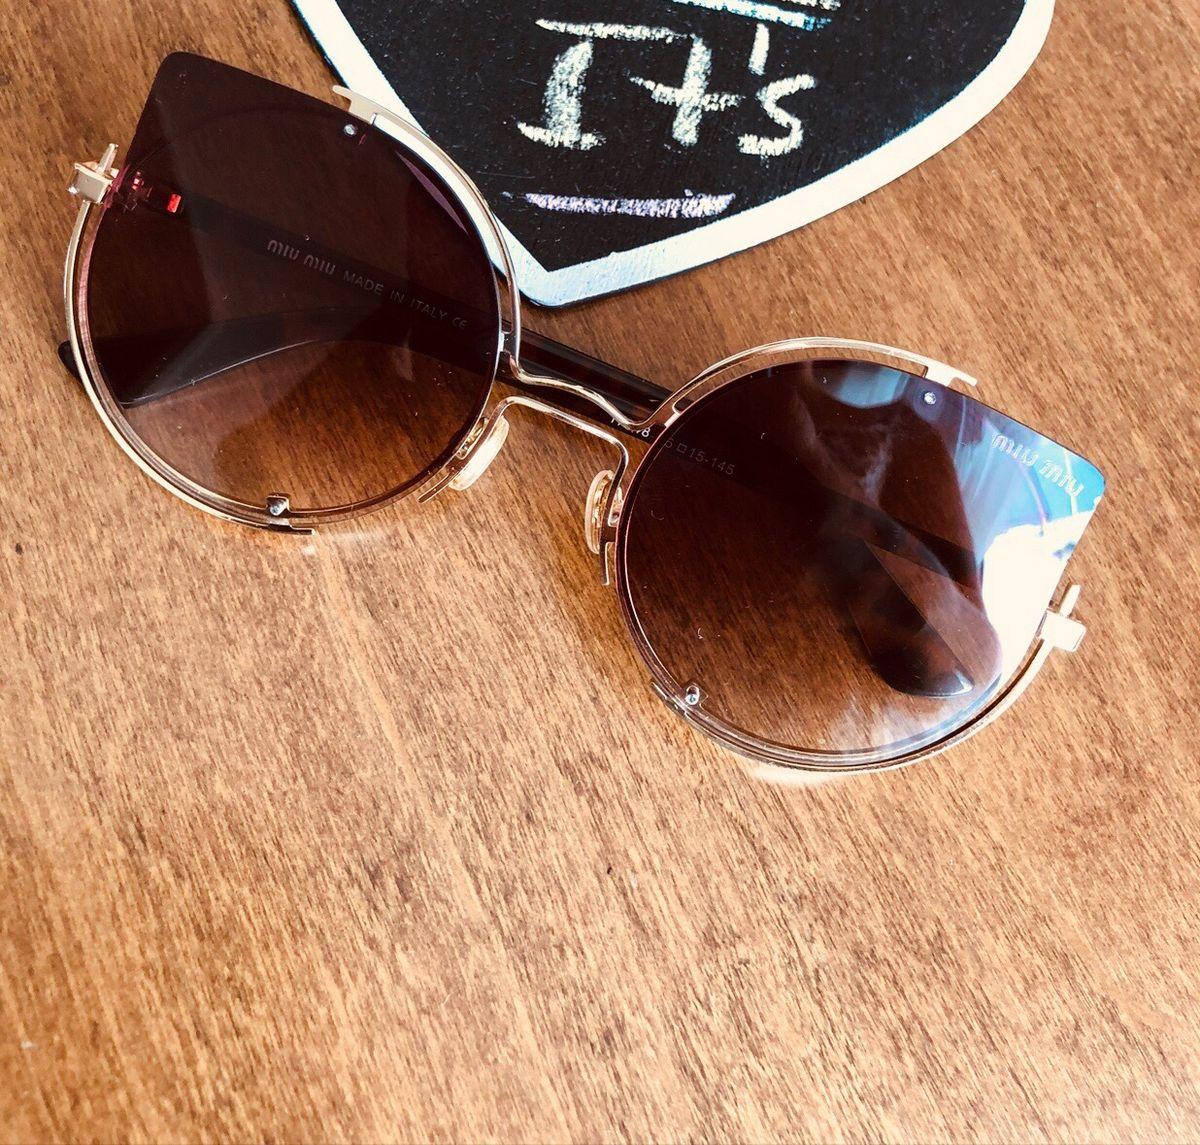 24329acd9fe4b óculos gucci oncinha com strass - óculos gucci.  Czm6ly9wag90b3muzw5qb2vplmnvbs5ici9wcm9kdwn0cy85nzuymtmxl2nmzda1yji0yti4mzvhzdljngzjnmjjztg5nda4mtu4lmpwzw  ...